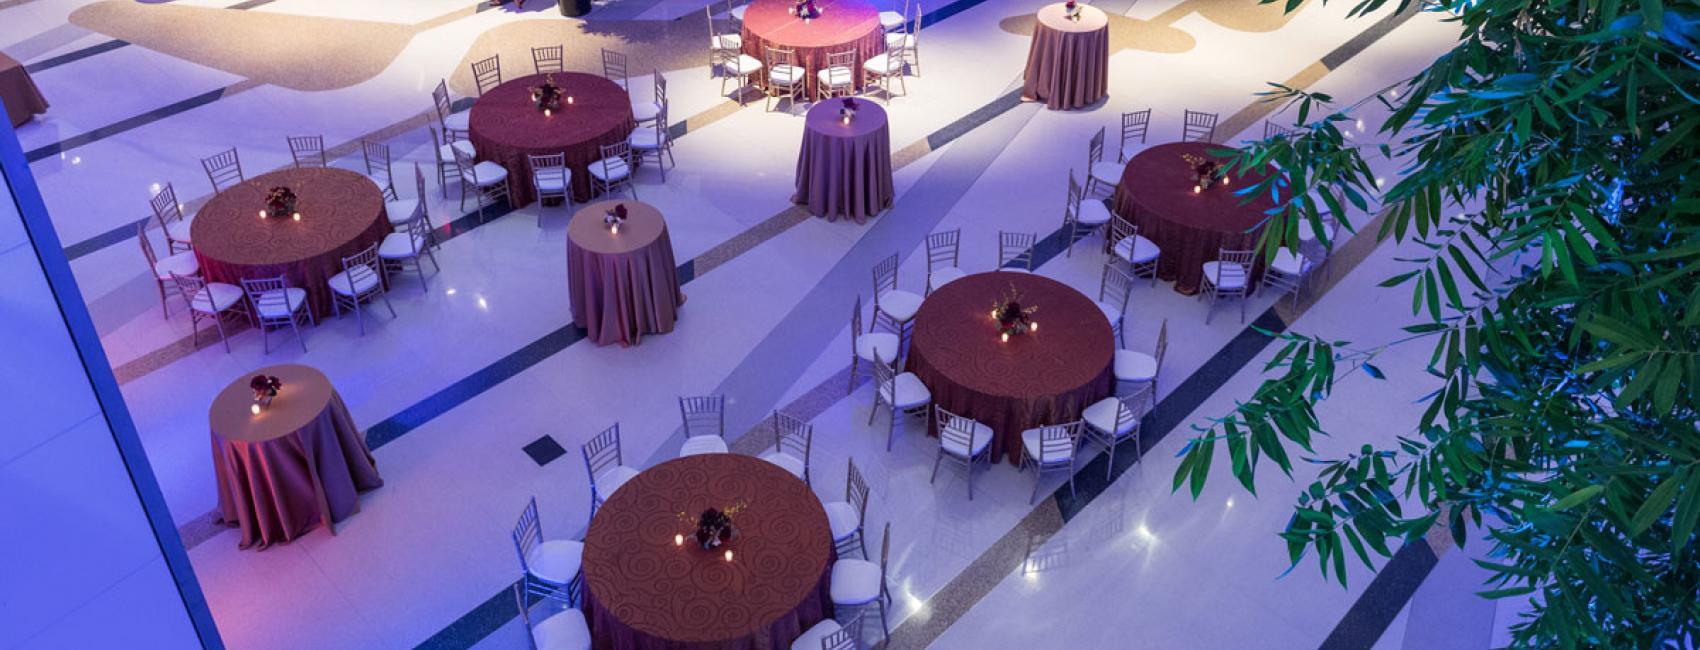 Award ceremony dining hall